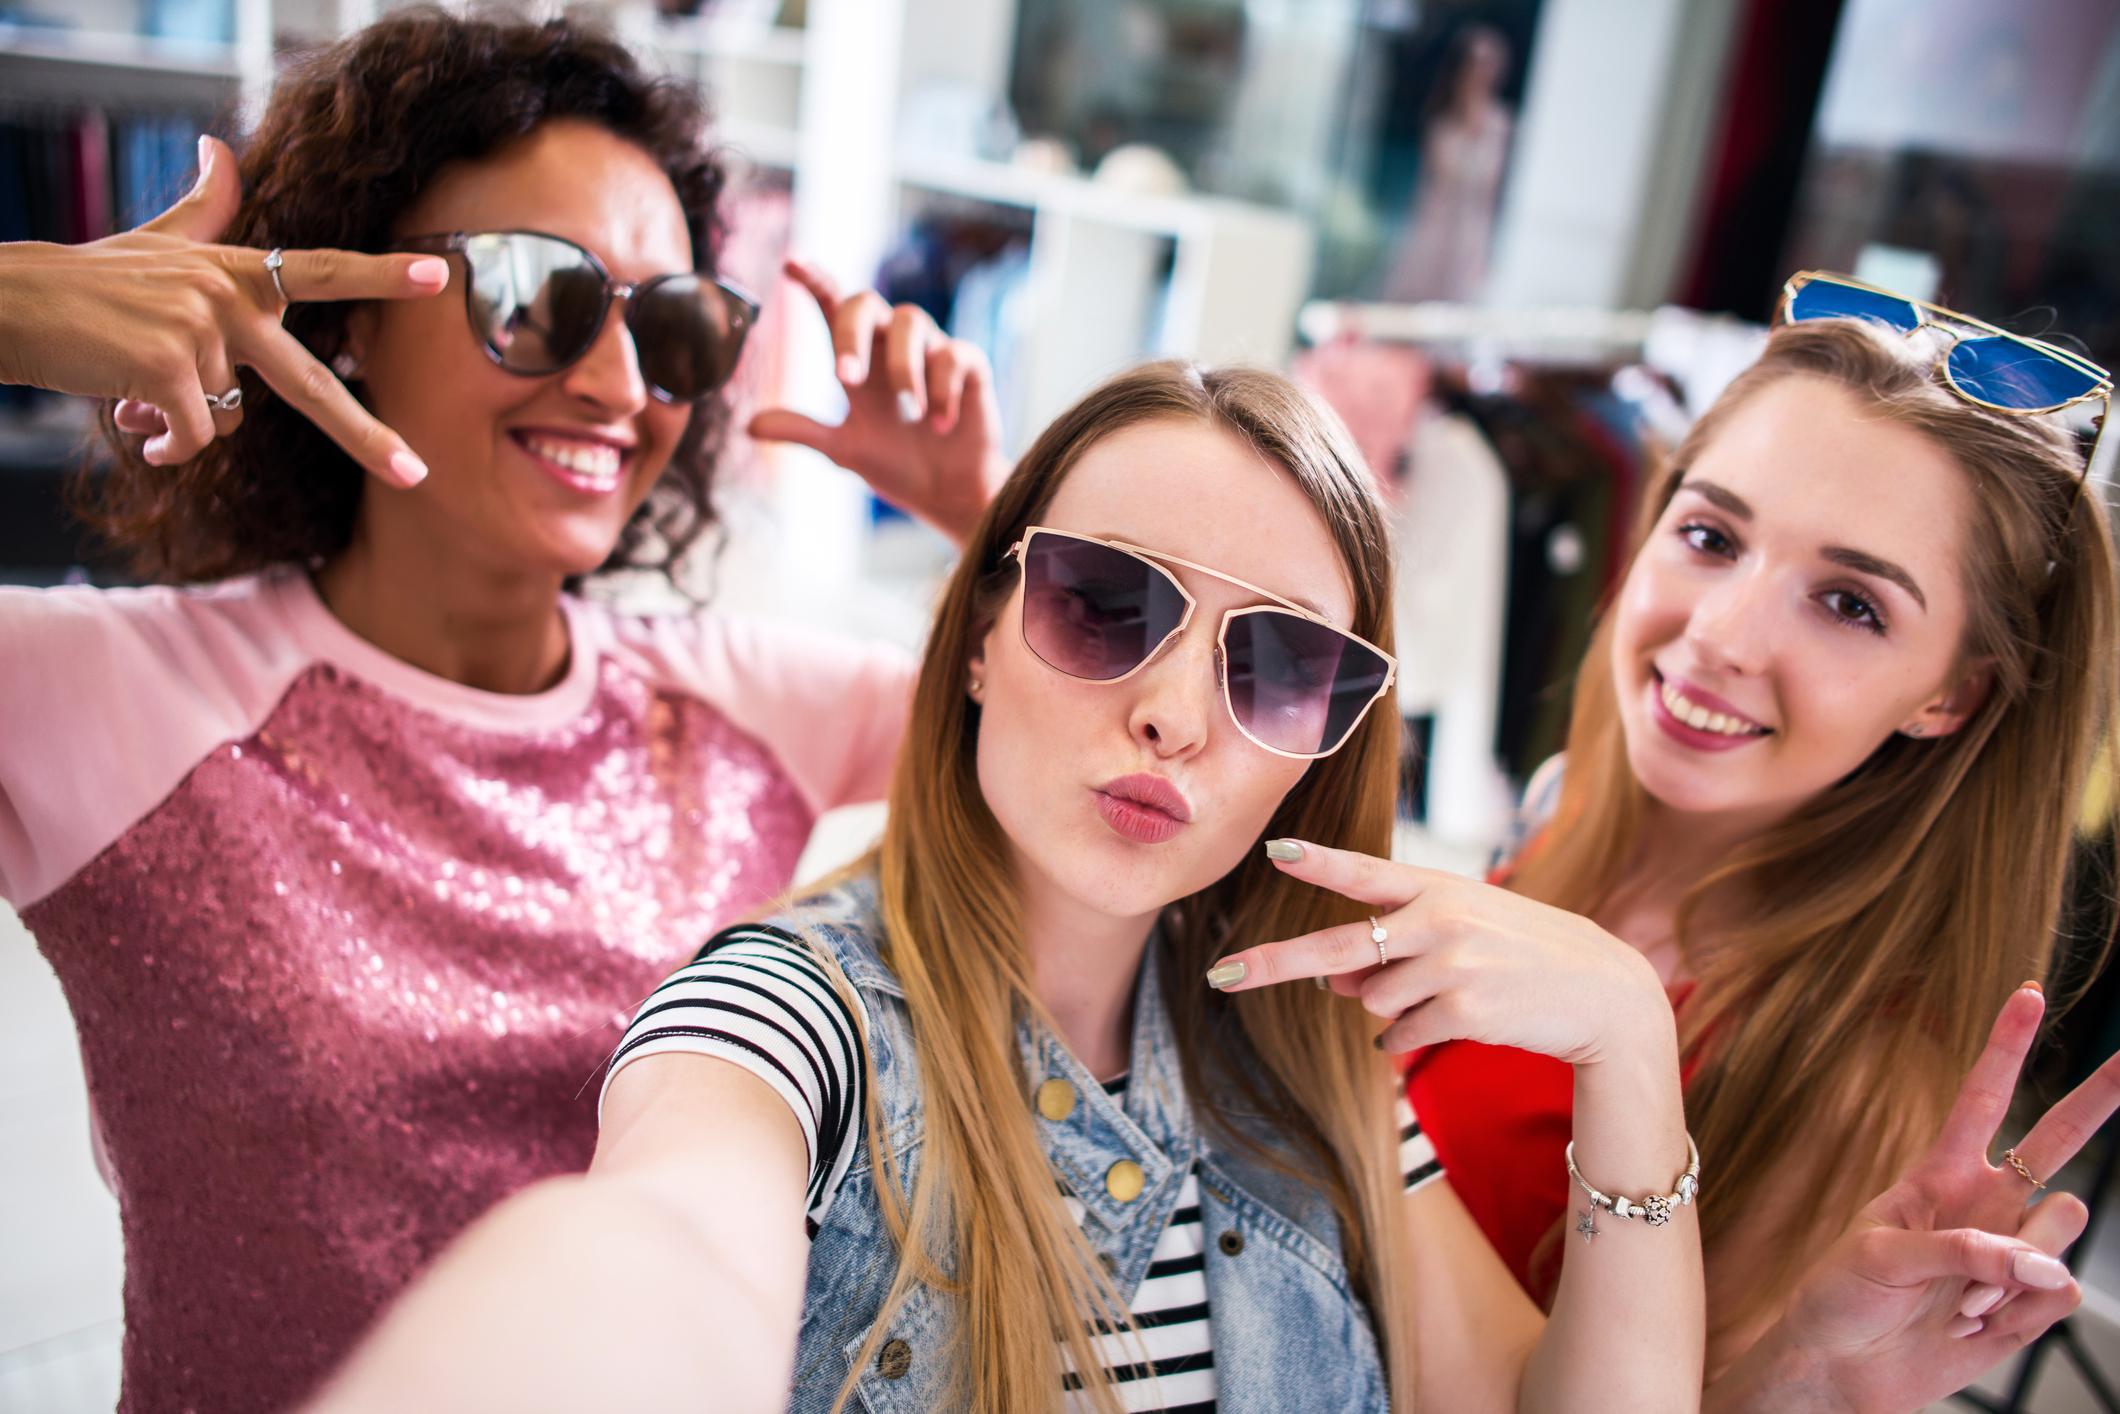 Three girls take a selfie.